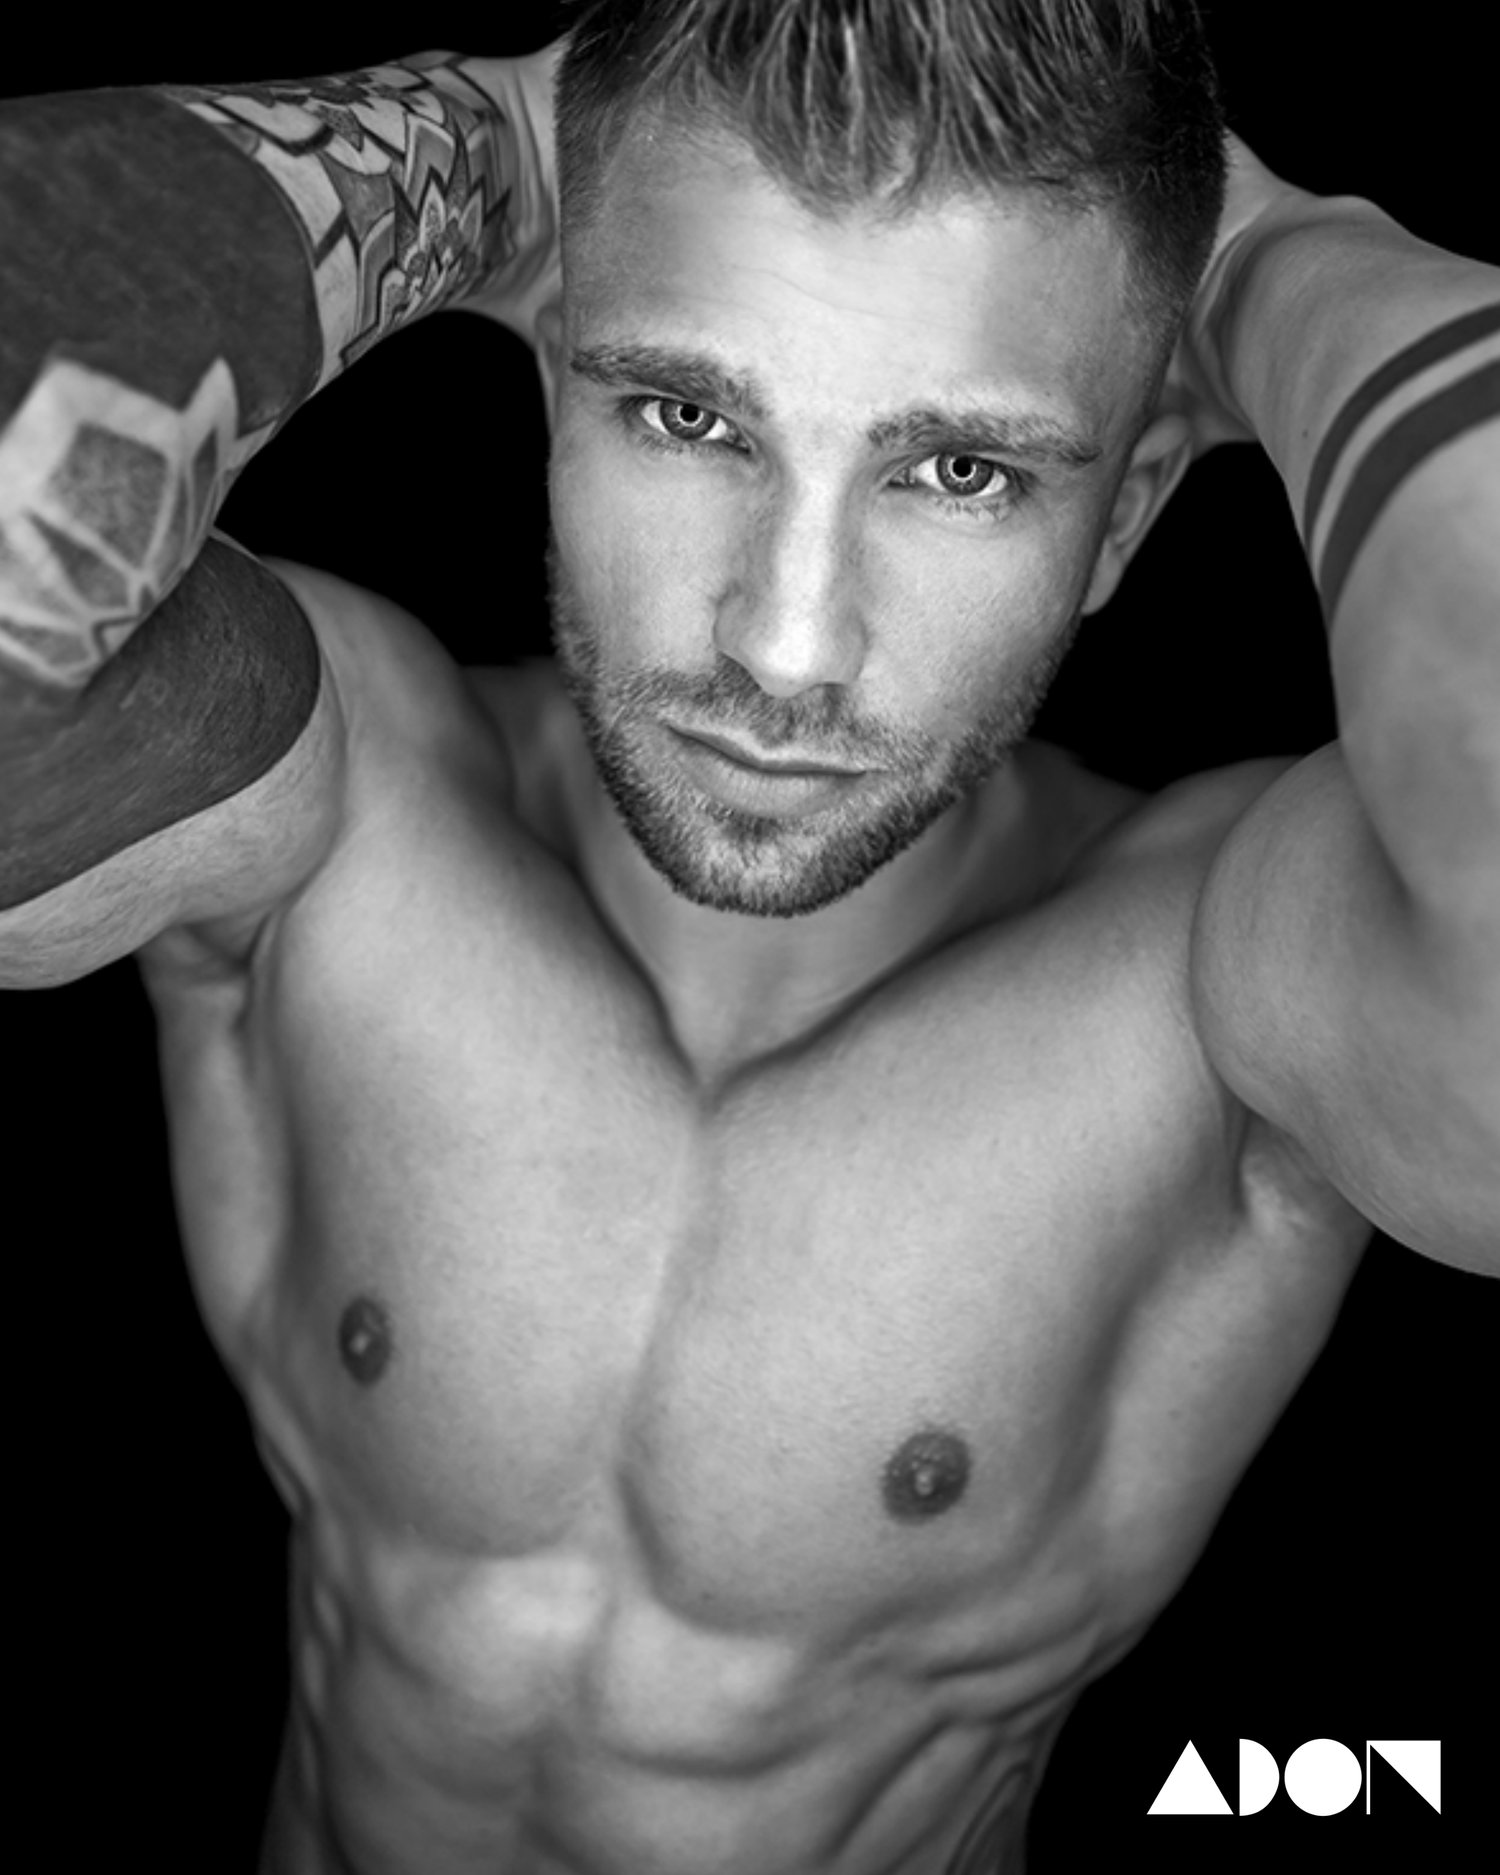 Adon Exclusive: Model Tobi By Giancarlo Balisciano